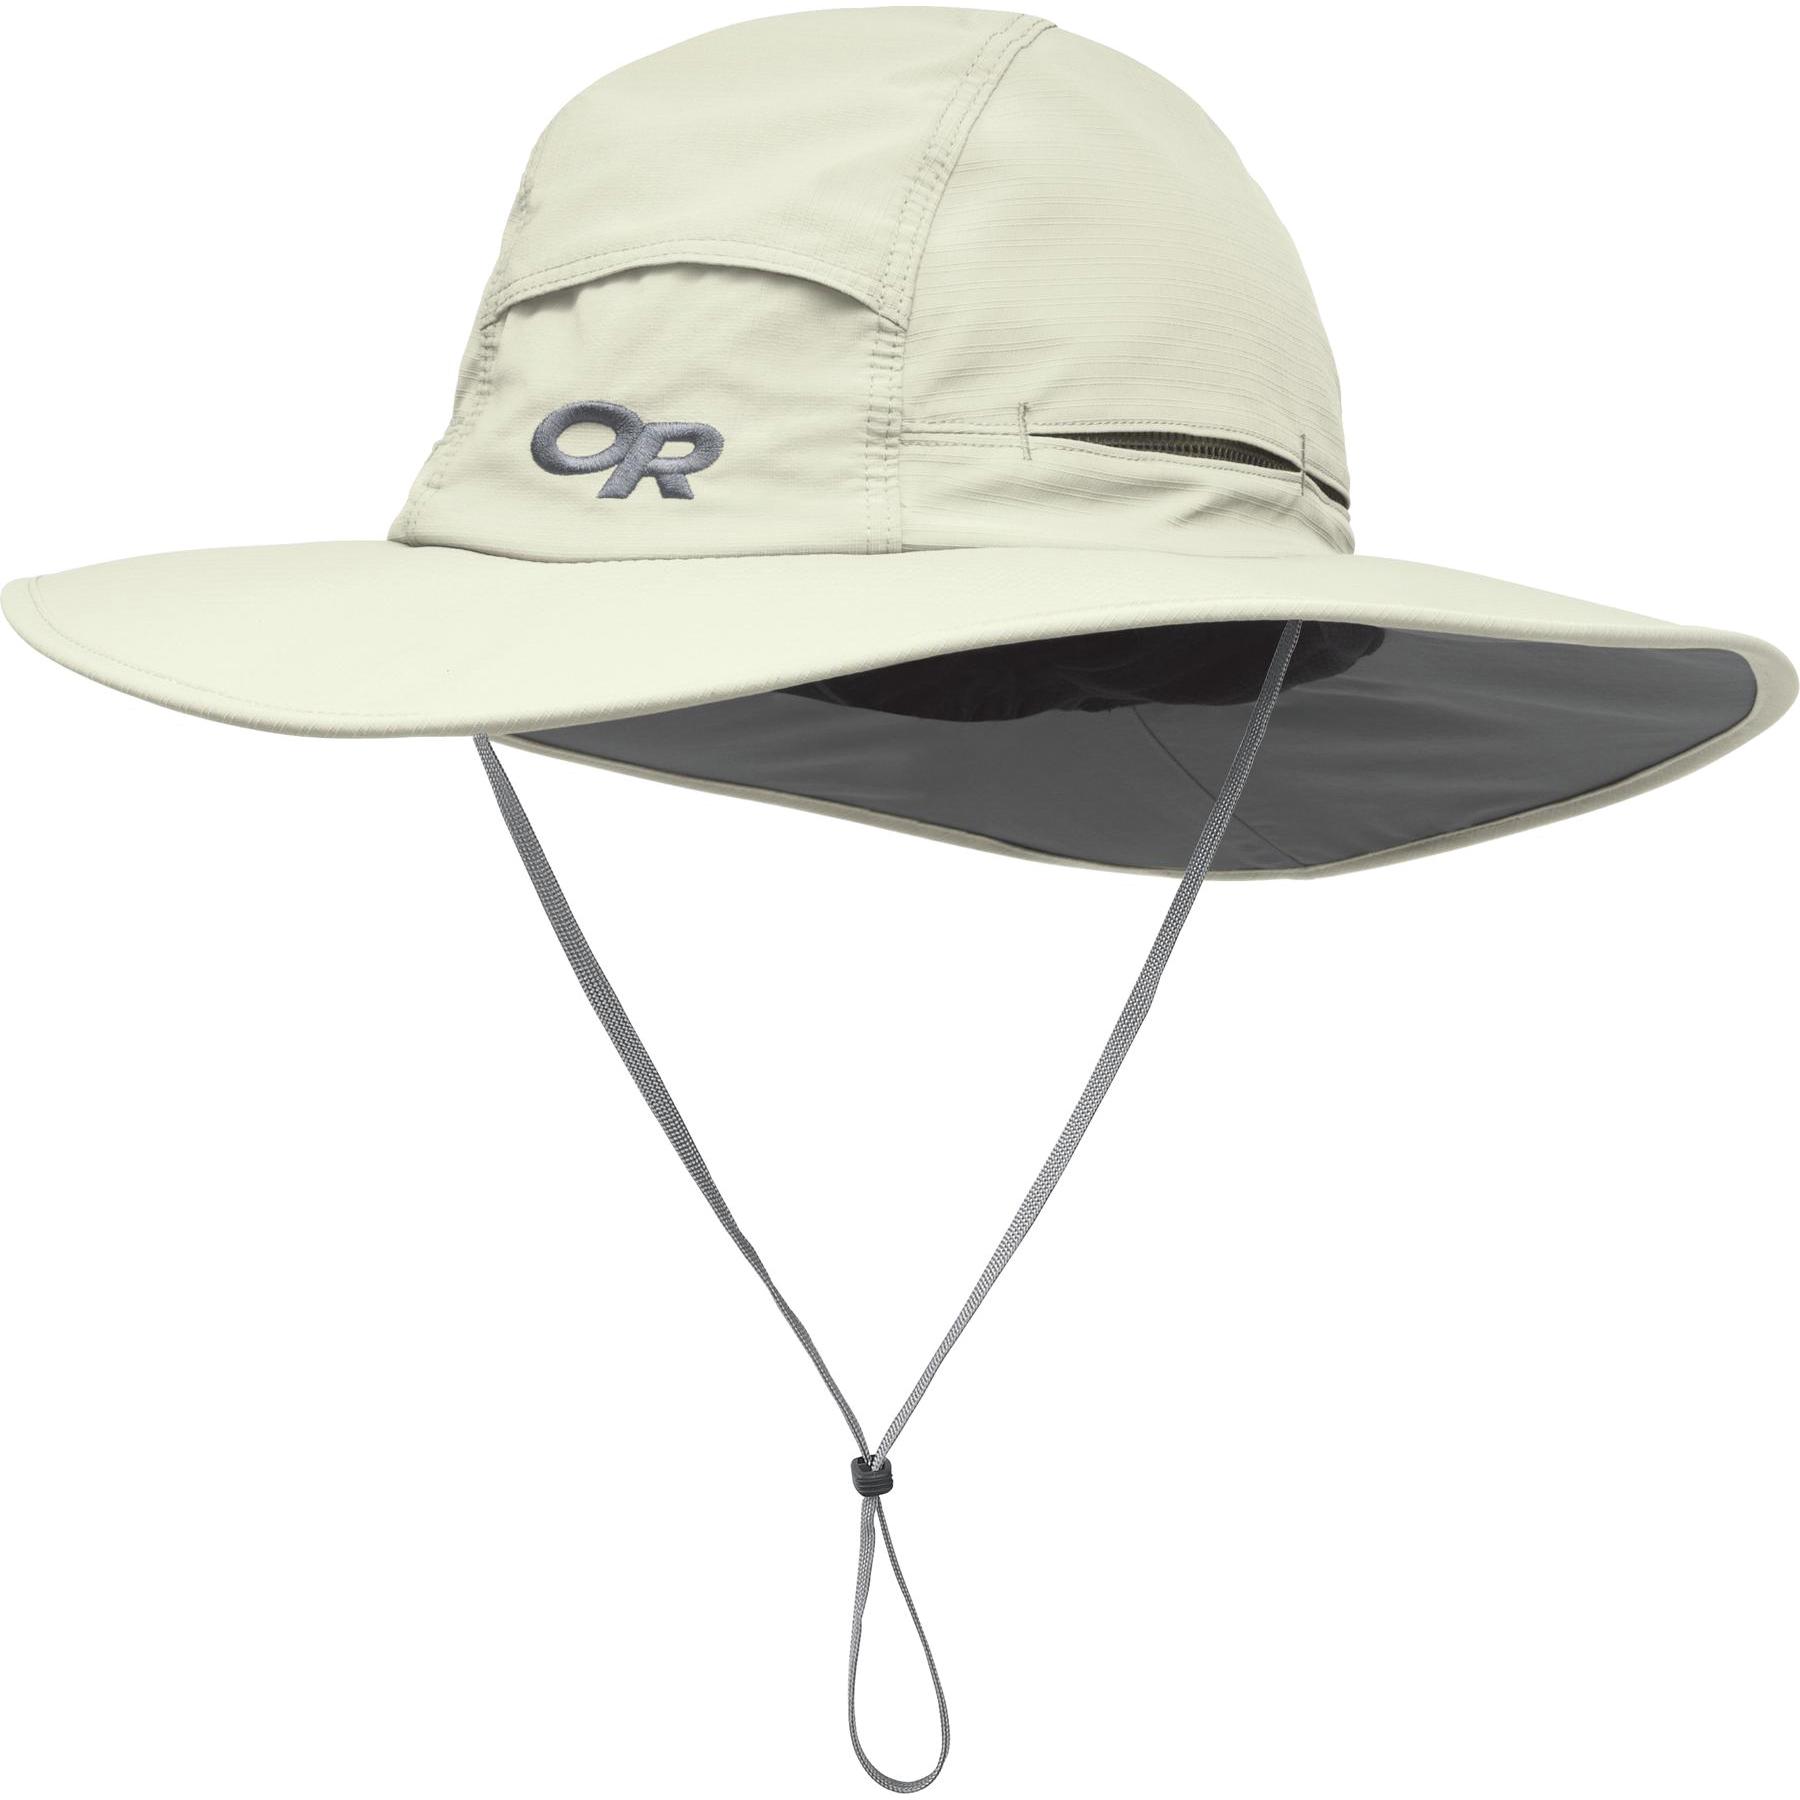 Outdoor Research Sombriolet Sun Hat - Adventure Gear Albury 21521419107